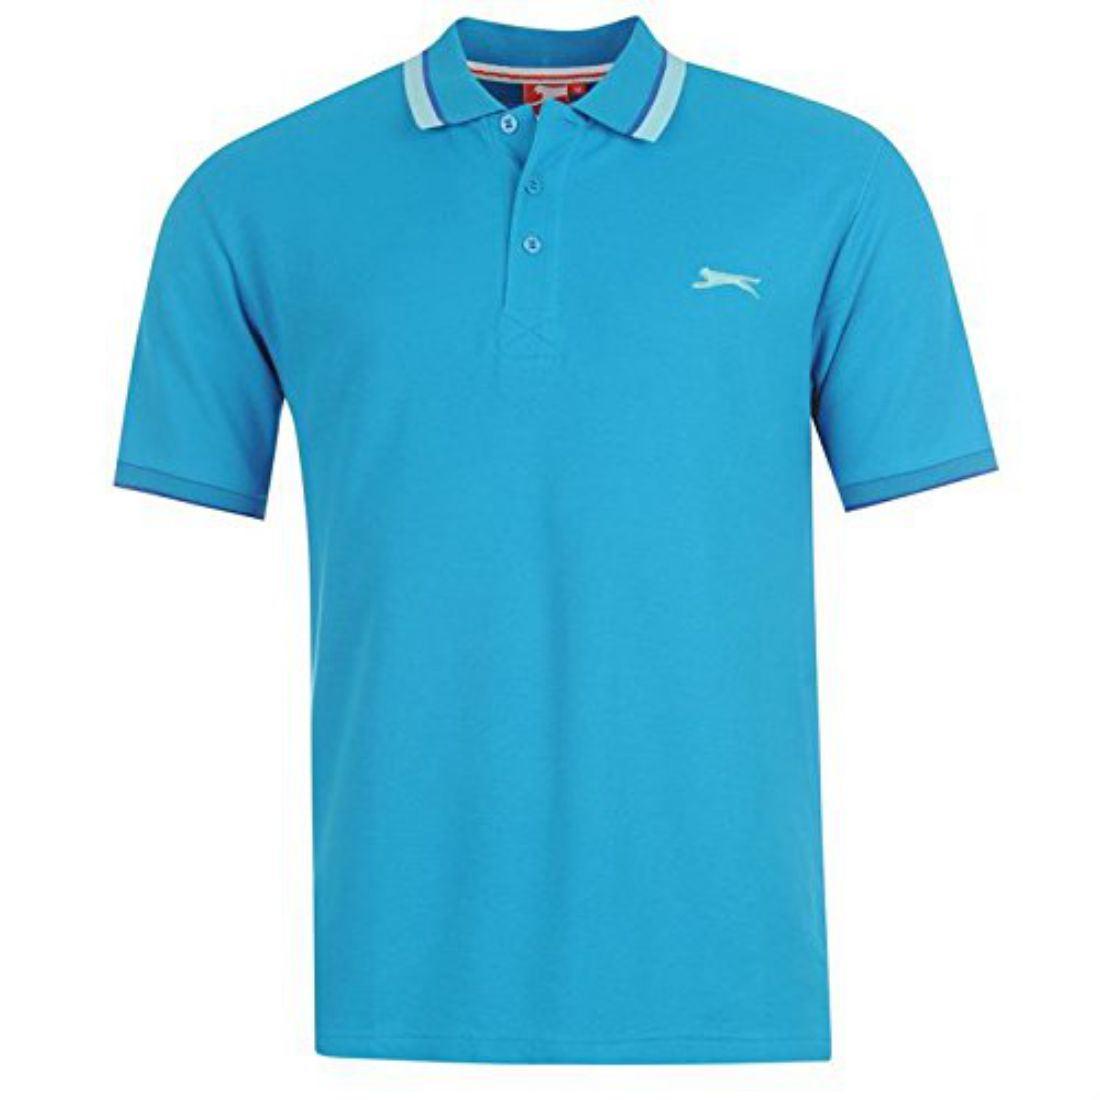 Slazenger mens clothing short sleeve tipped polo shirt for Best short sleeve shirts